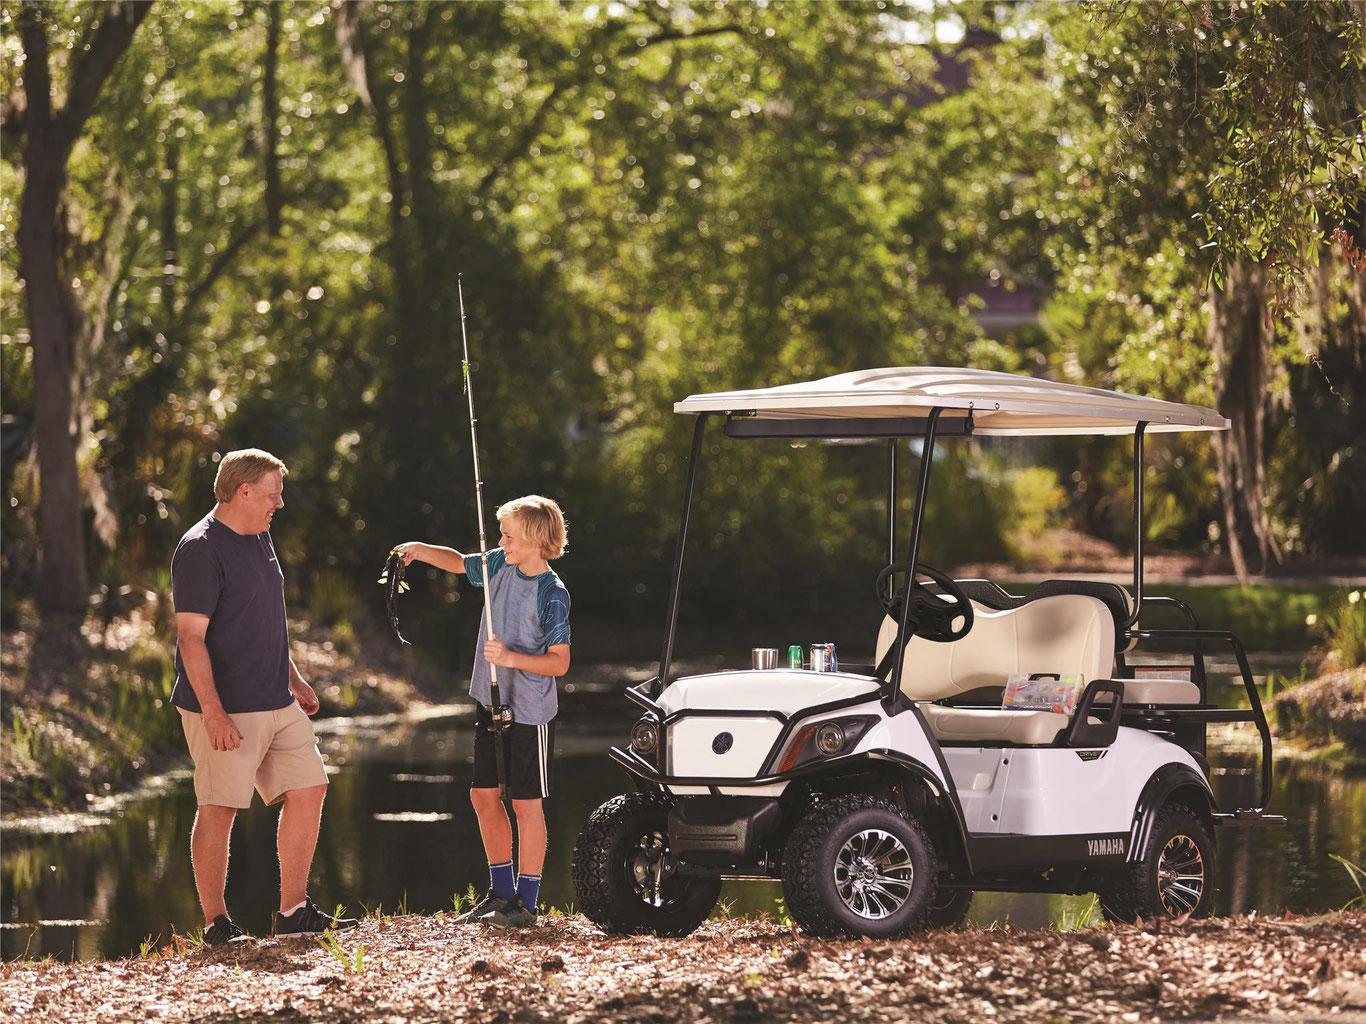 2018 Ezgo Gas Golf Cart Wiring Diagram – Articleblog.info Gas Wiring Cart Diagram Golf Ezgo H on